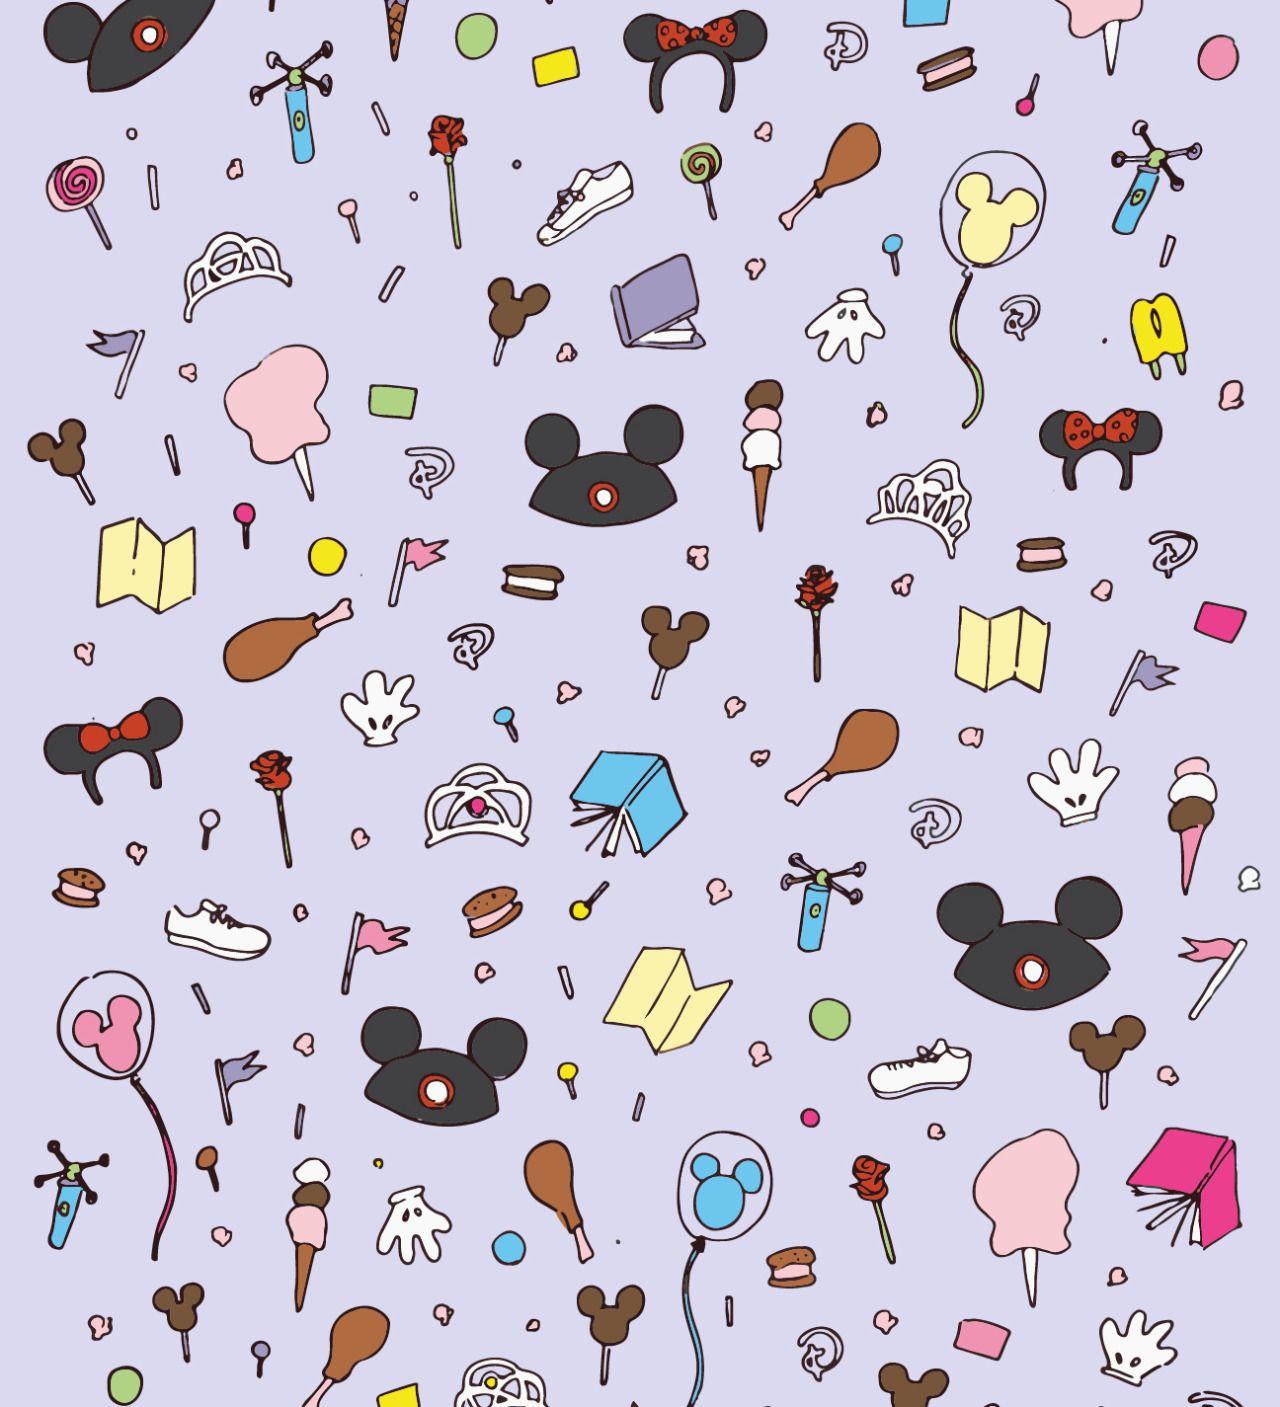 Purely Patterns Photo Disney Collage Disney Doodles Disney